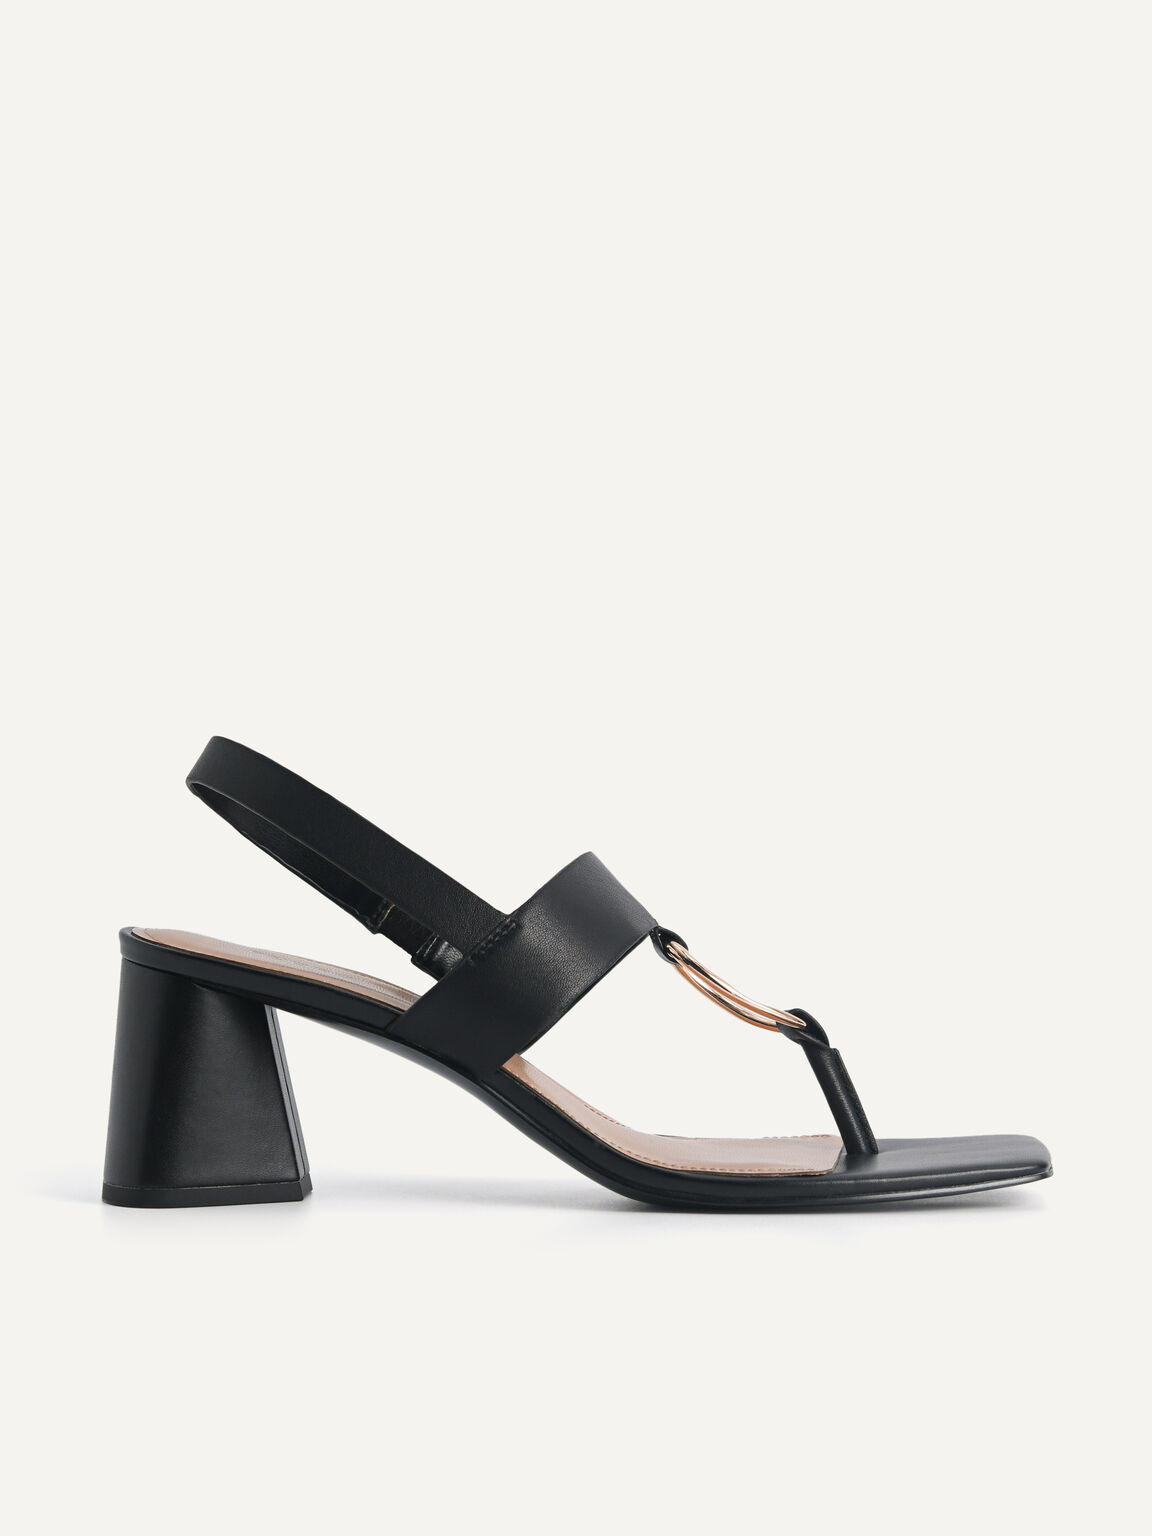 Leather Heeled Sandal With Gold Buckle, Black, hi-res